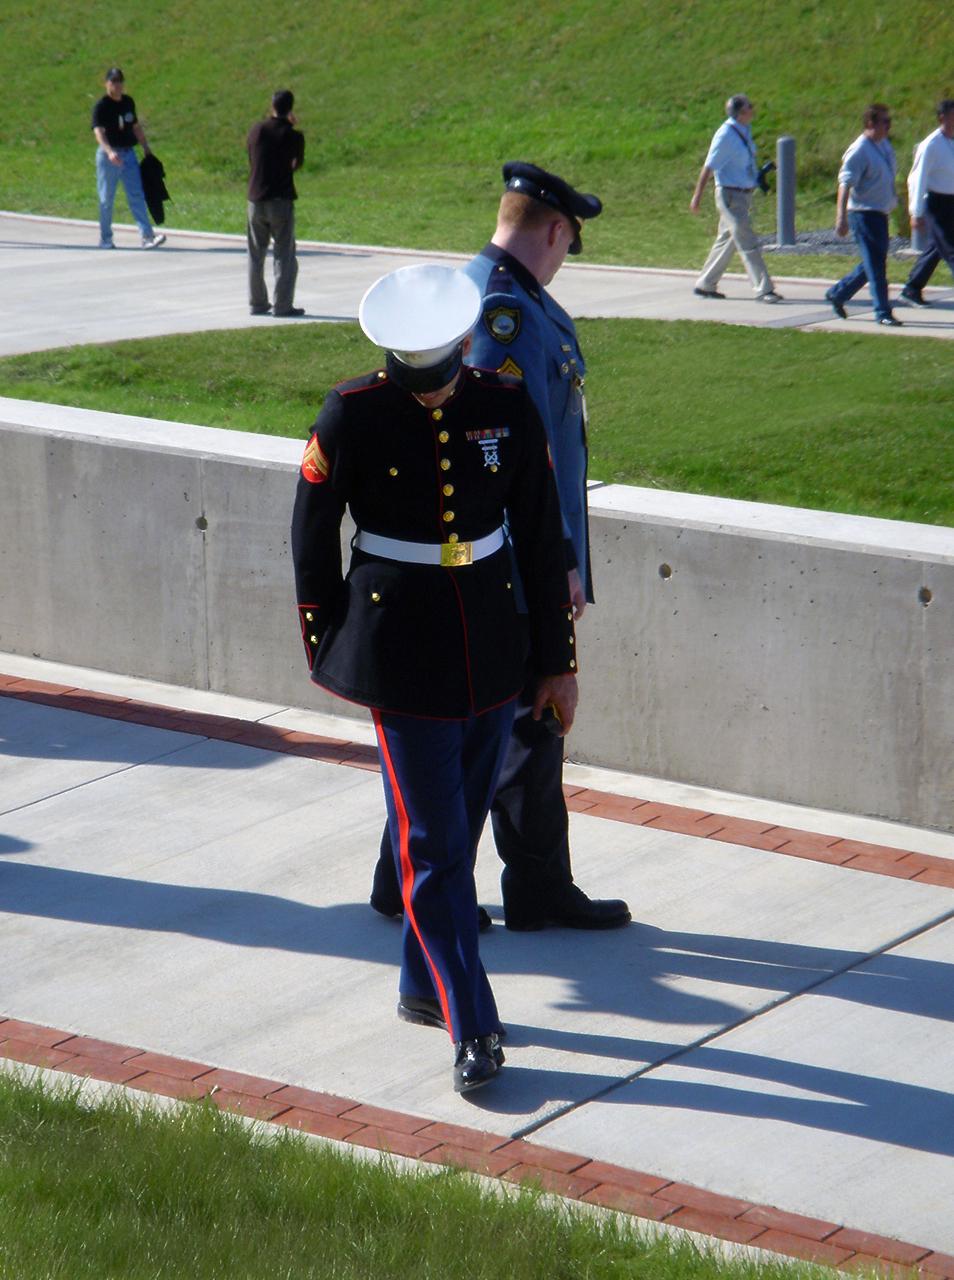 "<img src=""studioINSITE_Semper_Fidelis_Memorial_Park_Veterans.jpg""alt=""memorial_park_marines_national_america_semperfidelis_landscape_architecture_design_heroes_civic_cultural""title=""SemperFidelisMemorialPark""/>"